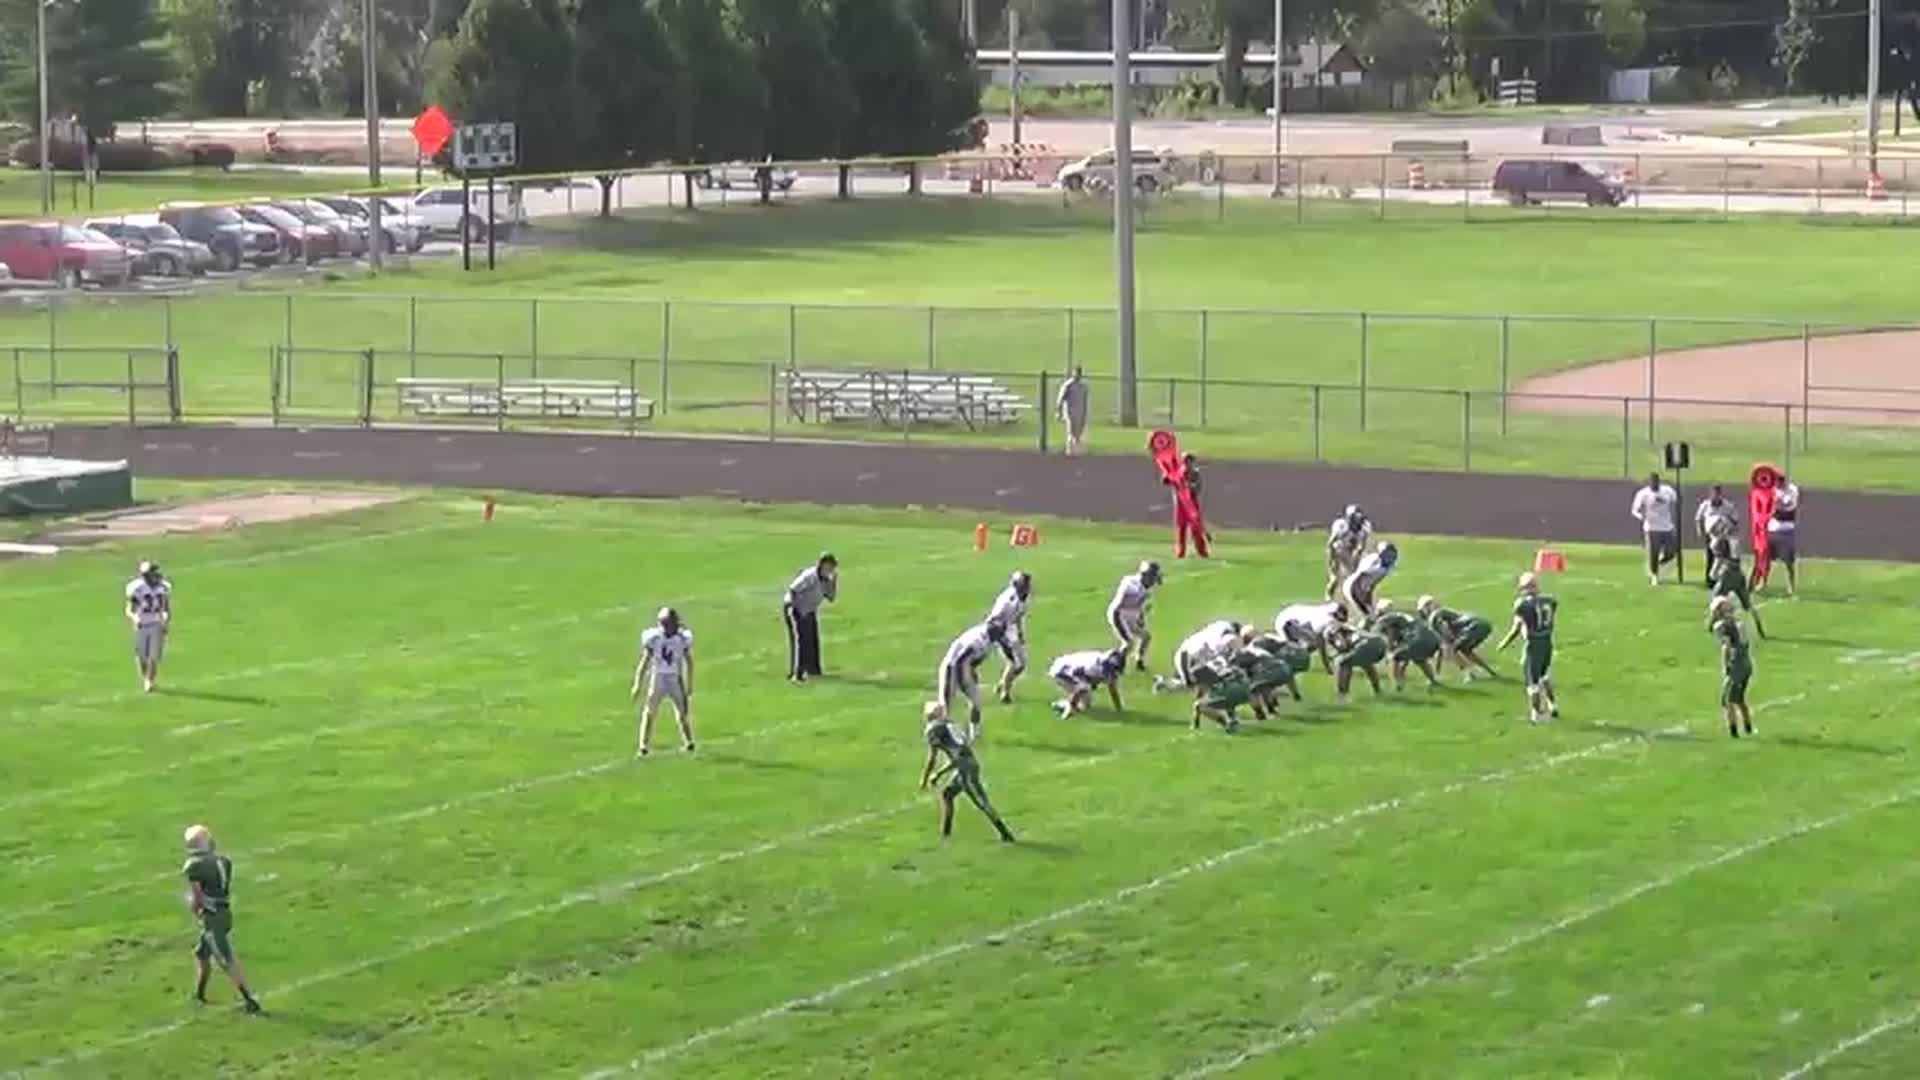 Braden Breedlove's interception playing football for